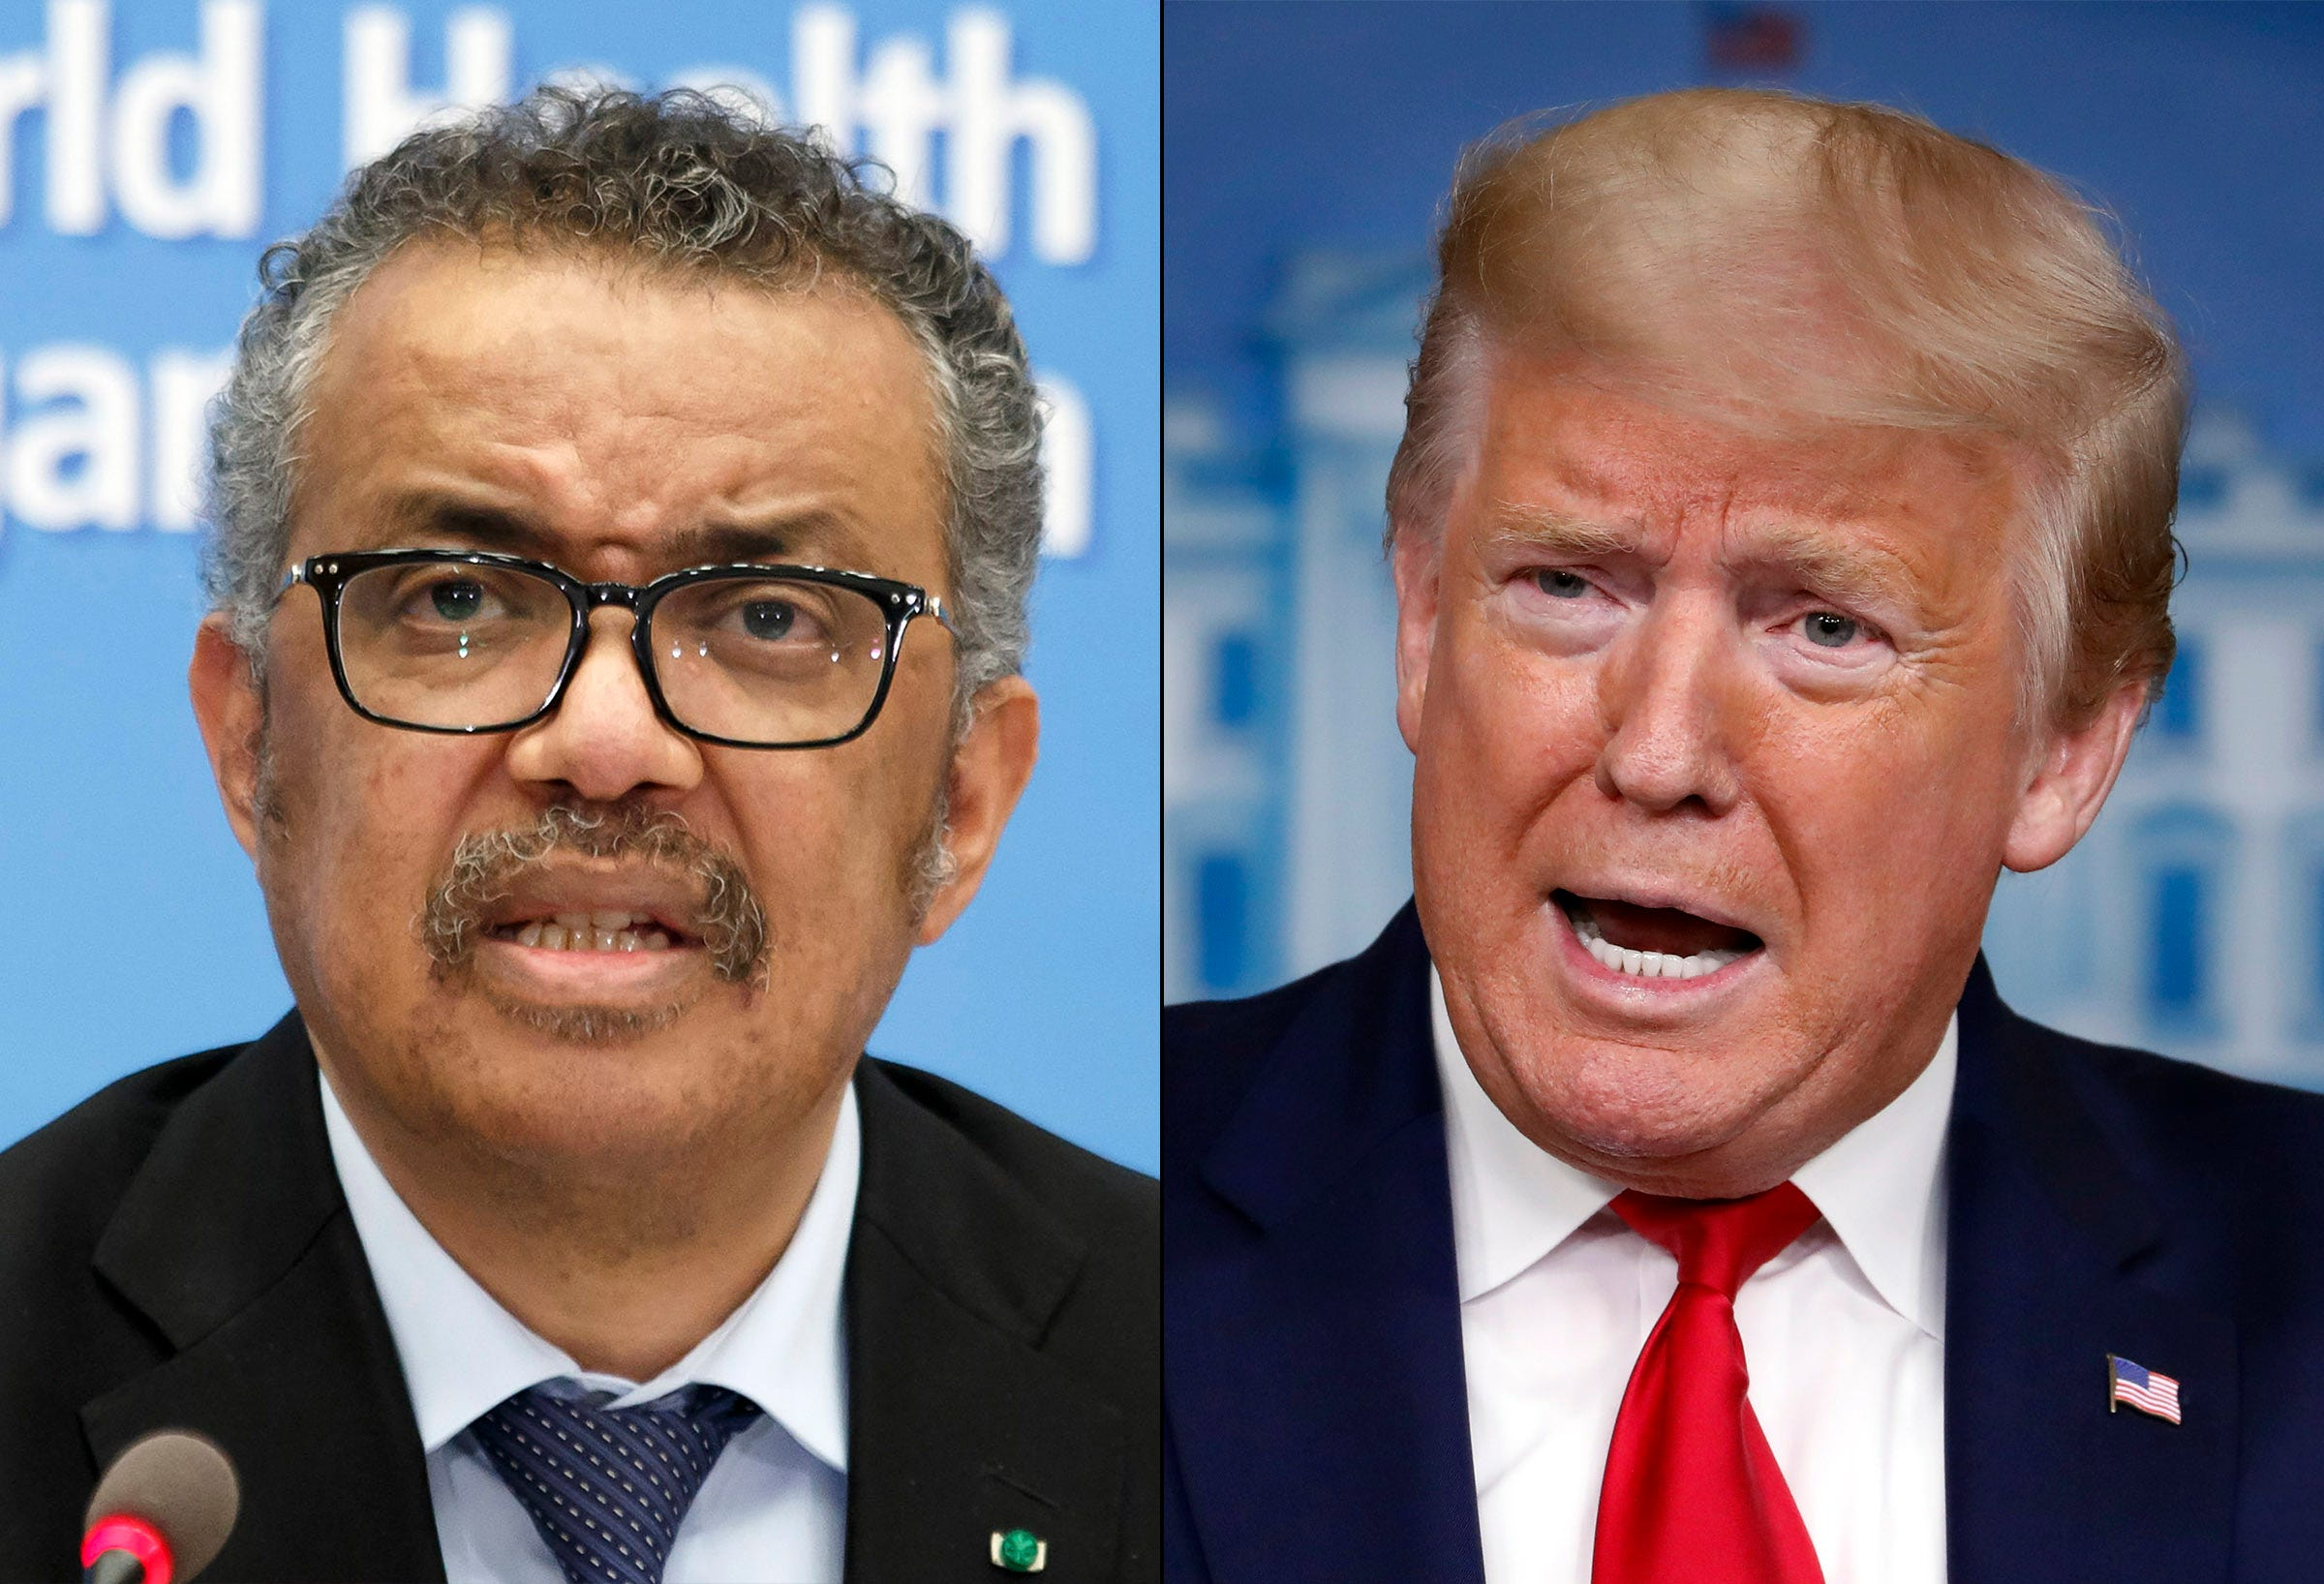 From left, World Health Organization director Tedros Adhanom Ghebreyesus and US President Donald J. Trump.